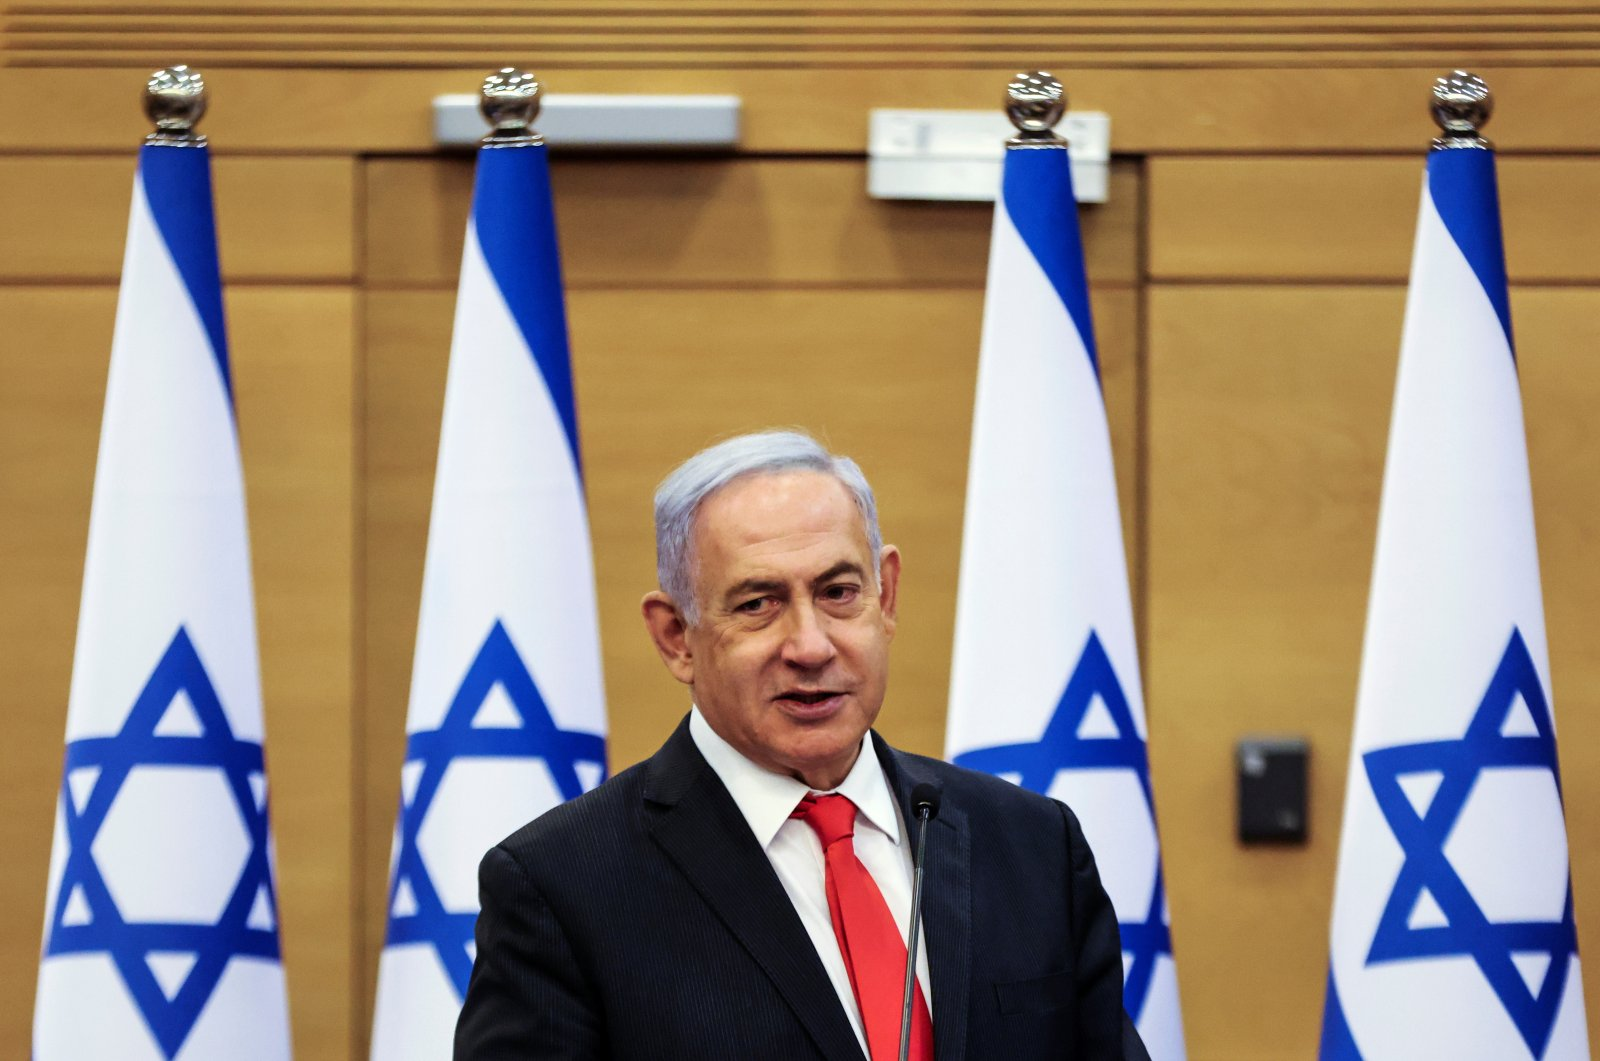 Leader of Israeli opposition Benjamin Netanyahu speaks during a meeting with his Likud party at the Israeli Parliament, in West Jerusalem, Israel, June 14, 2021. (Reuters Photo)